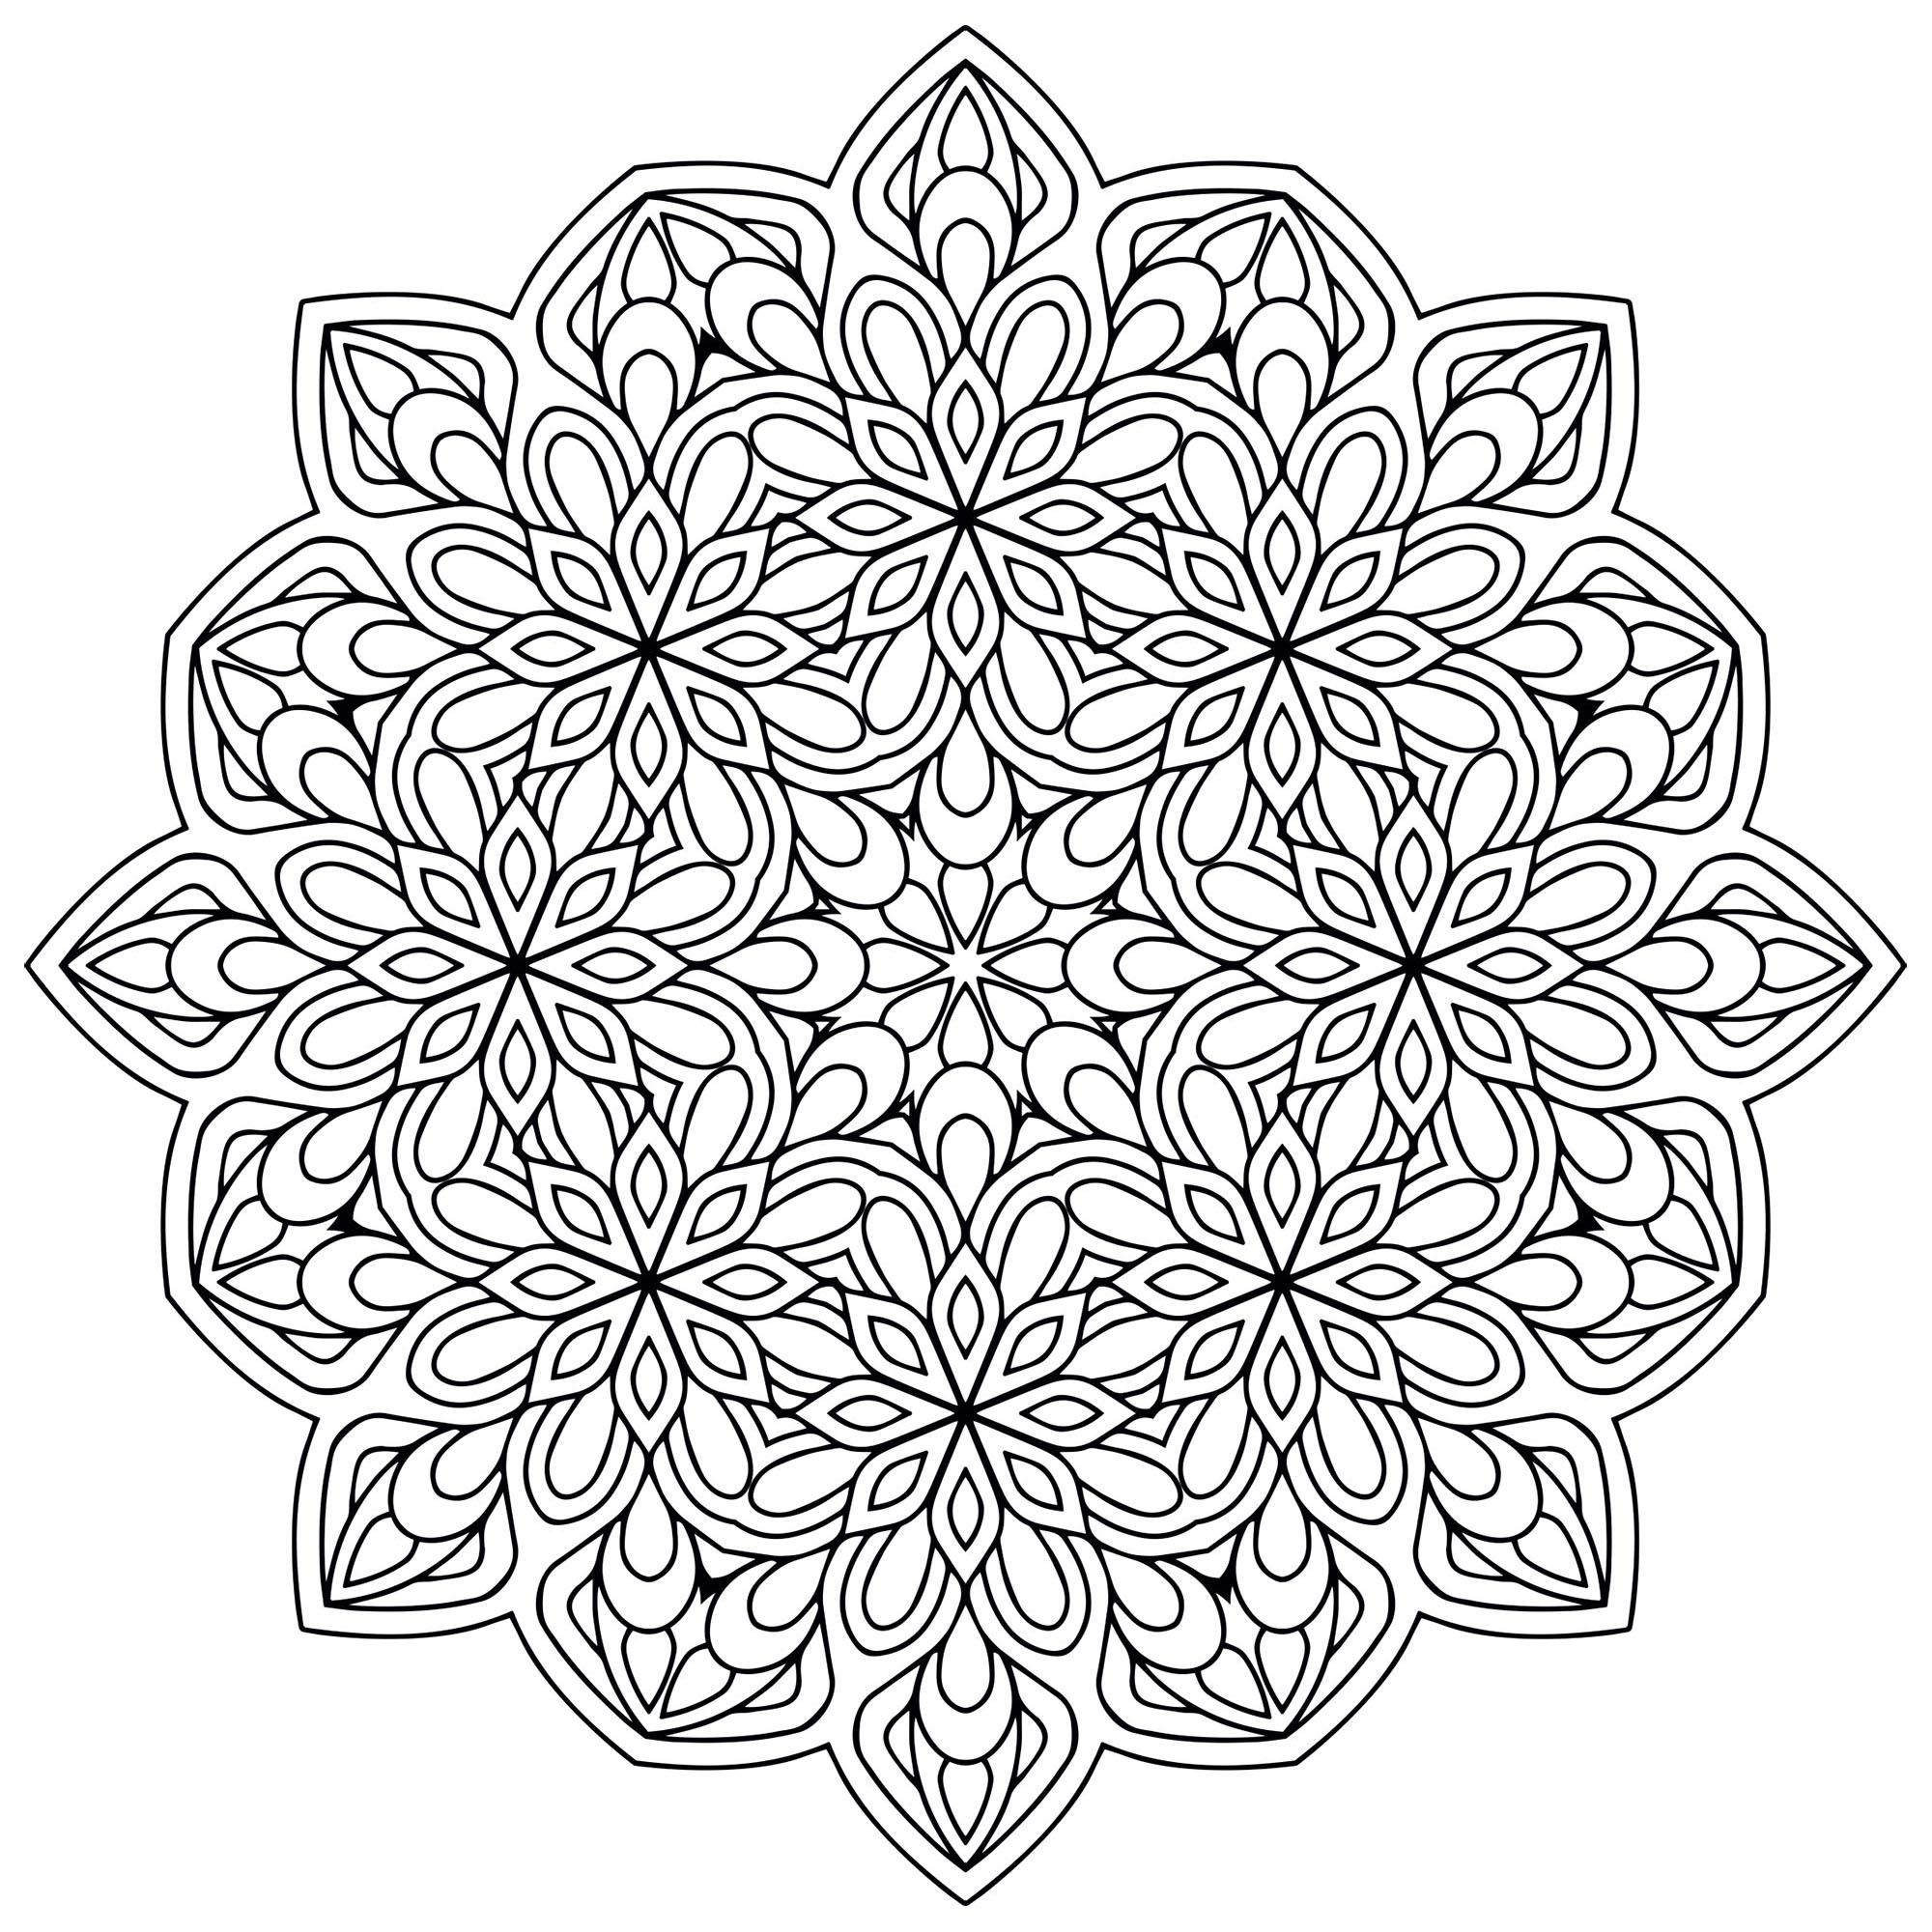 Mandala Zen & Anti-Stress - 9